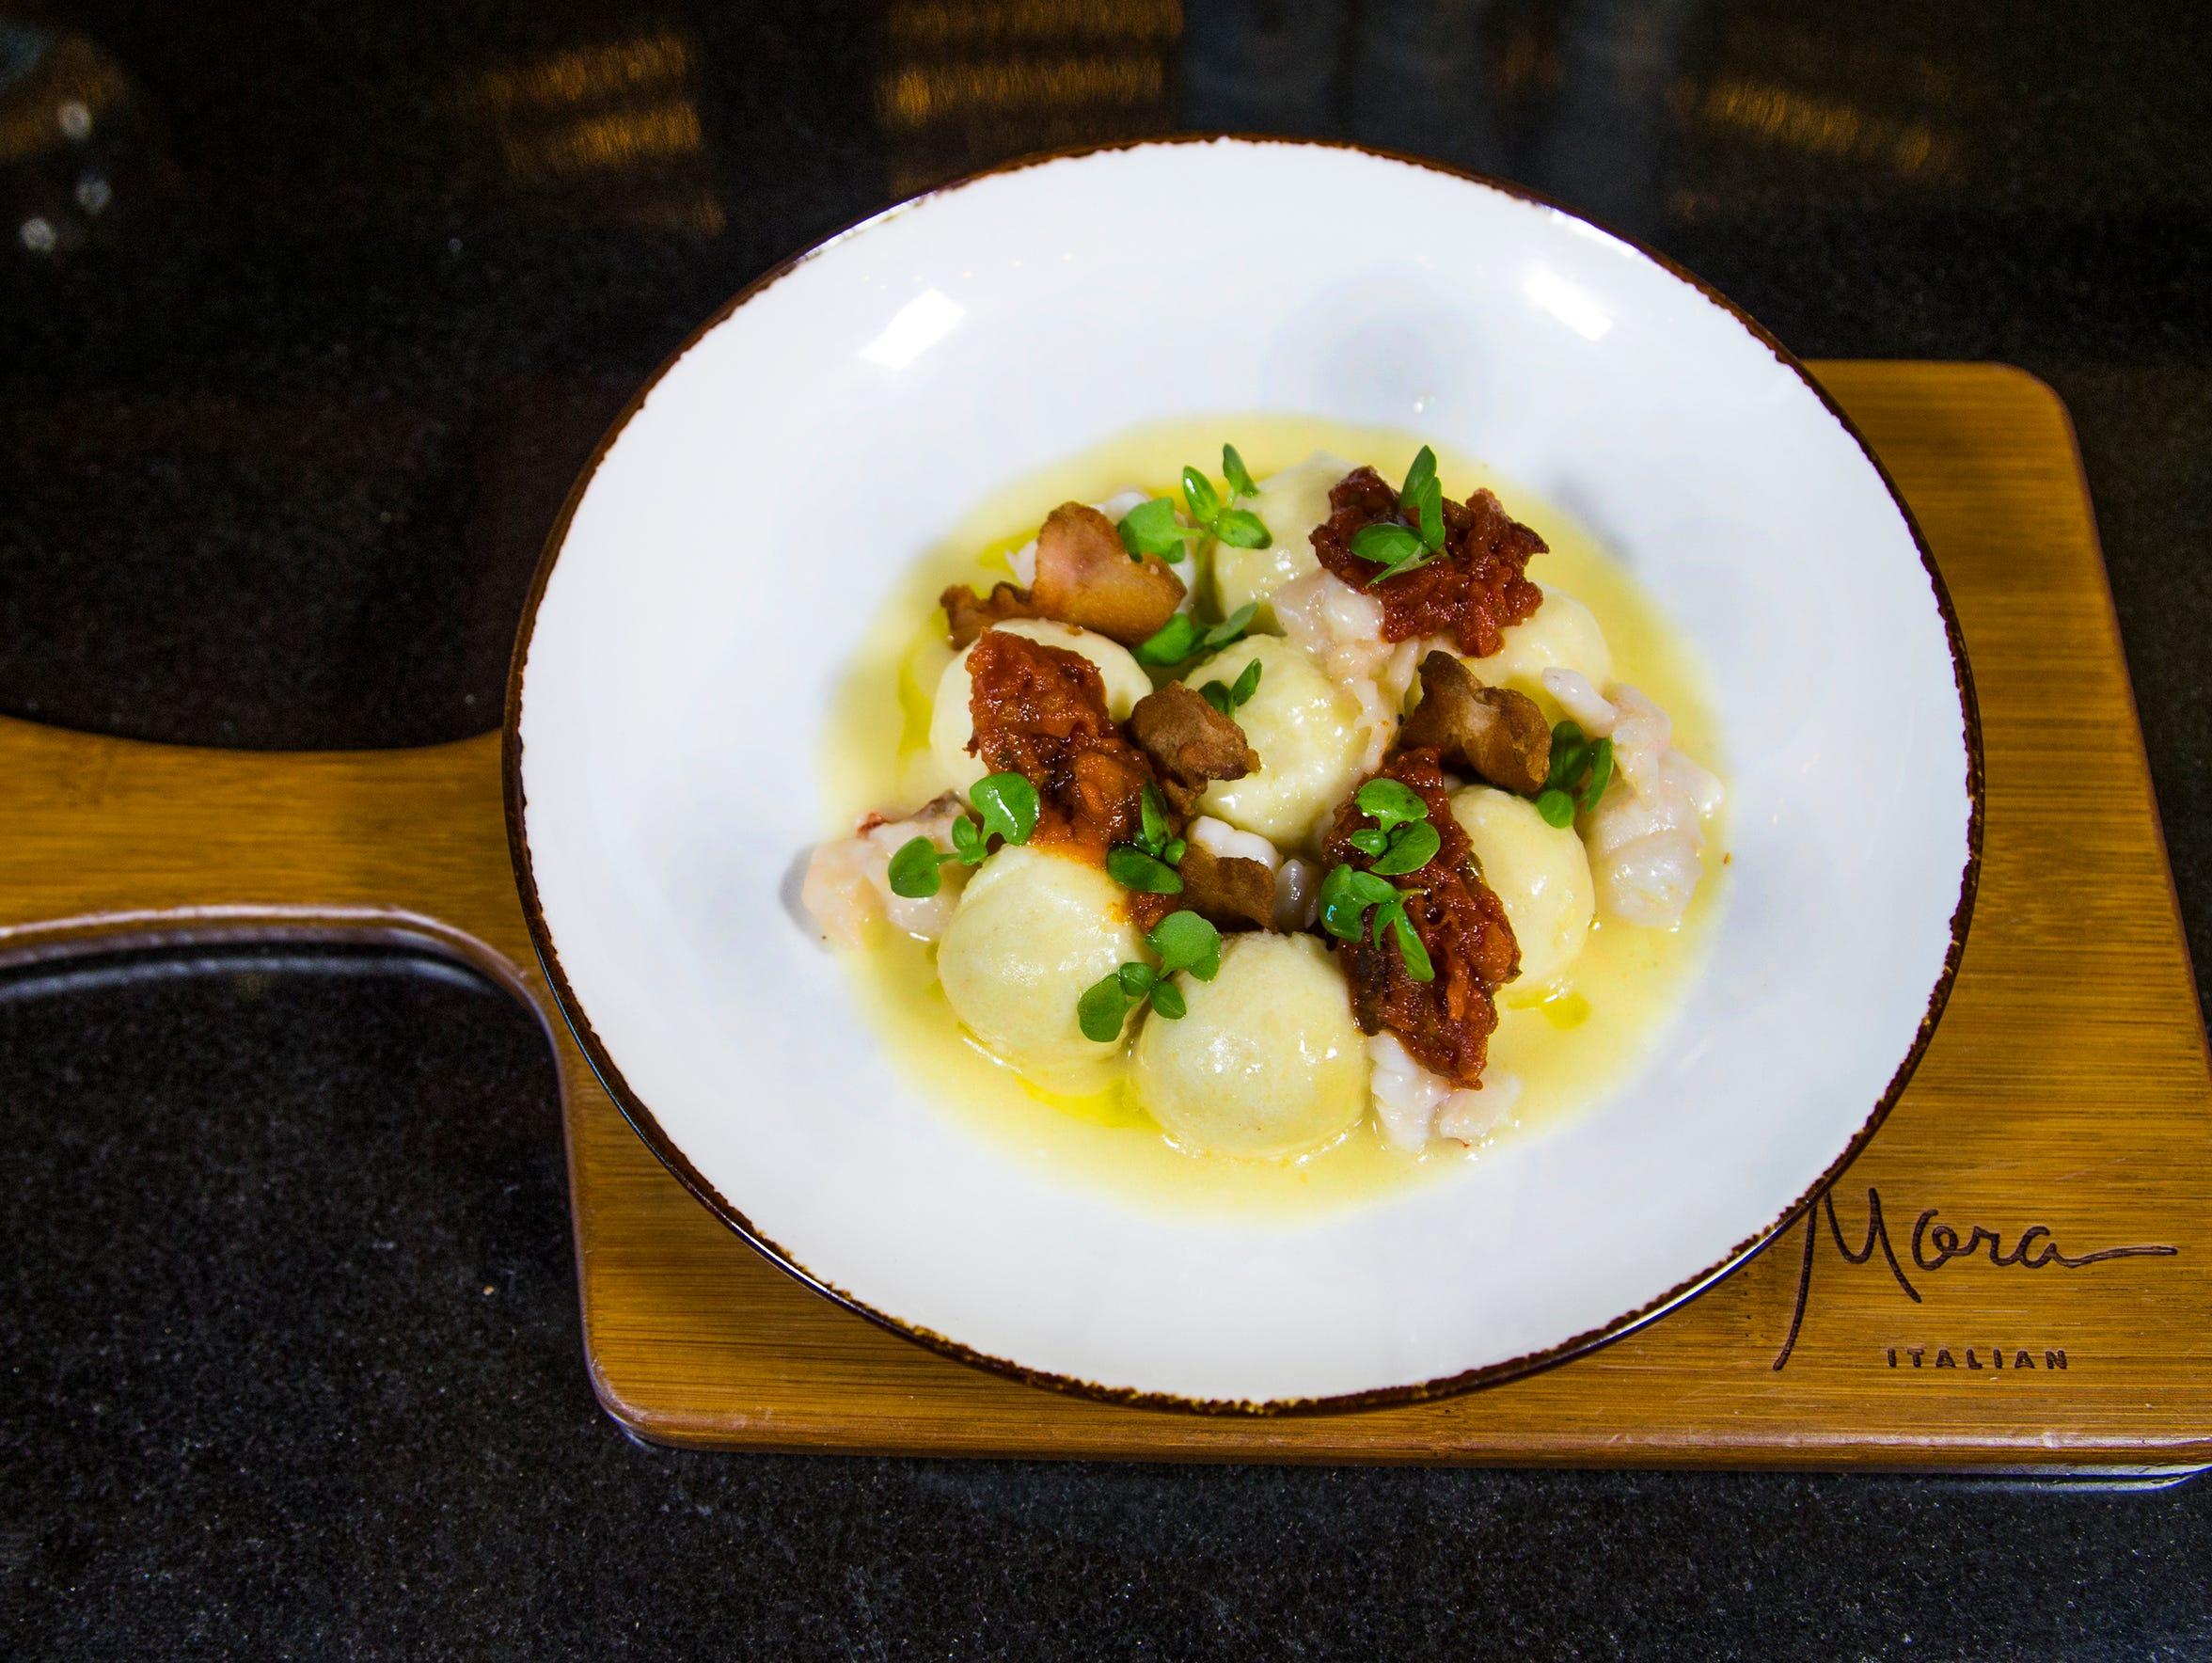 The ricotta and mascarpone gnudi from Mora Italian.